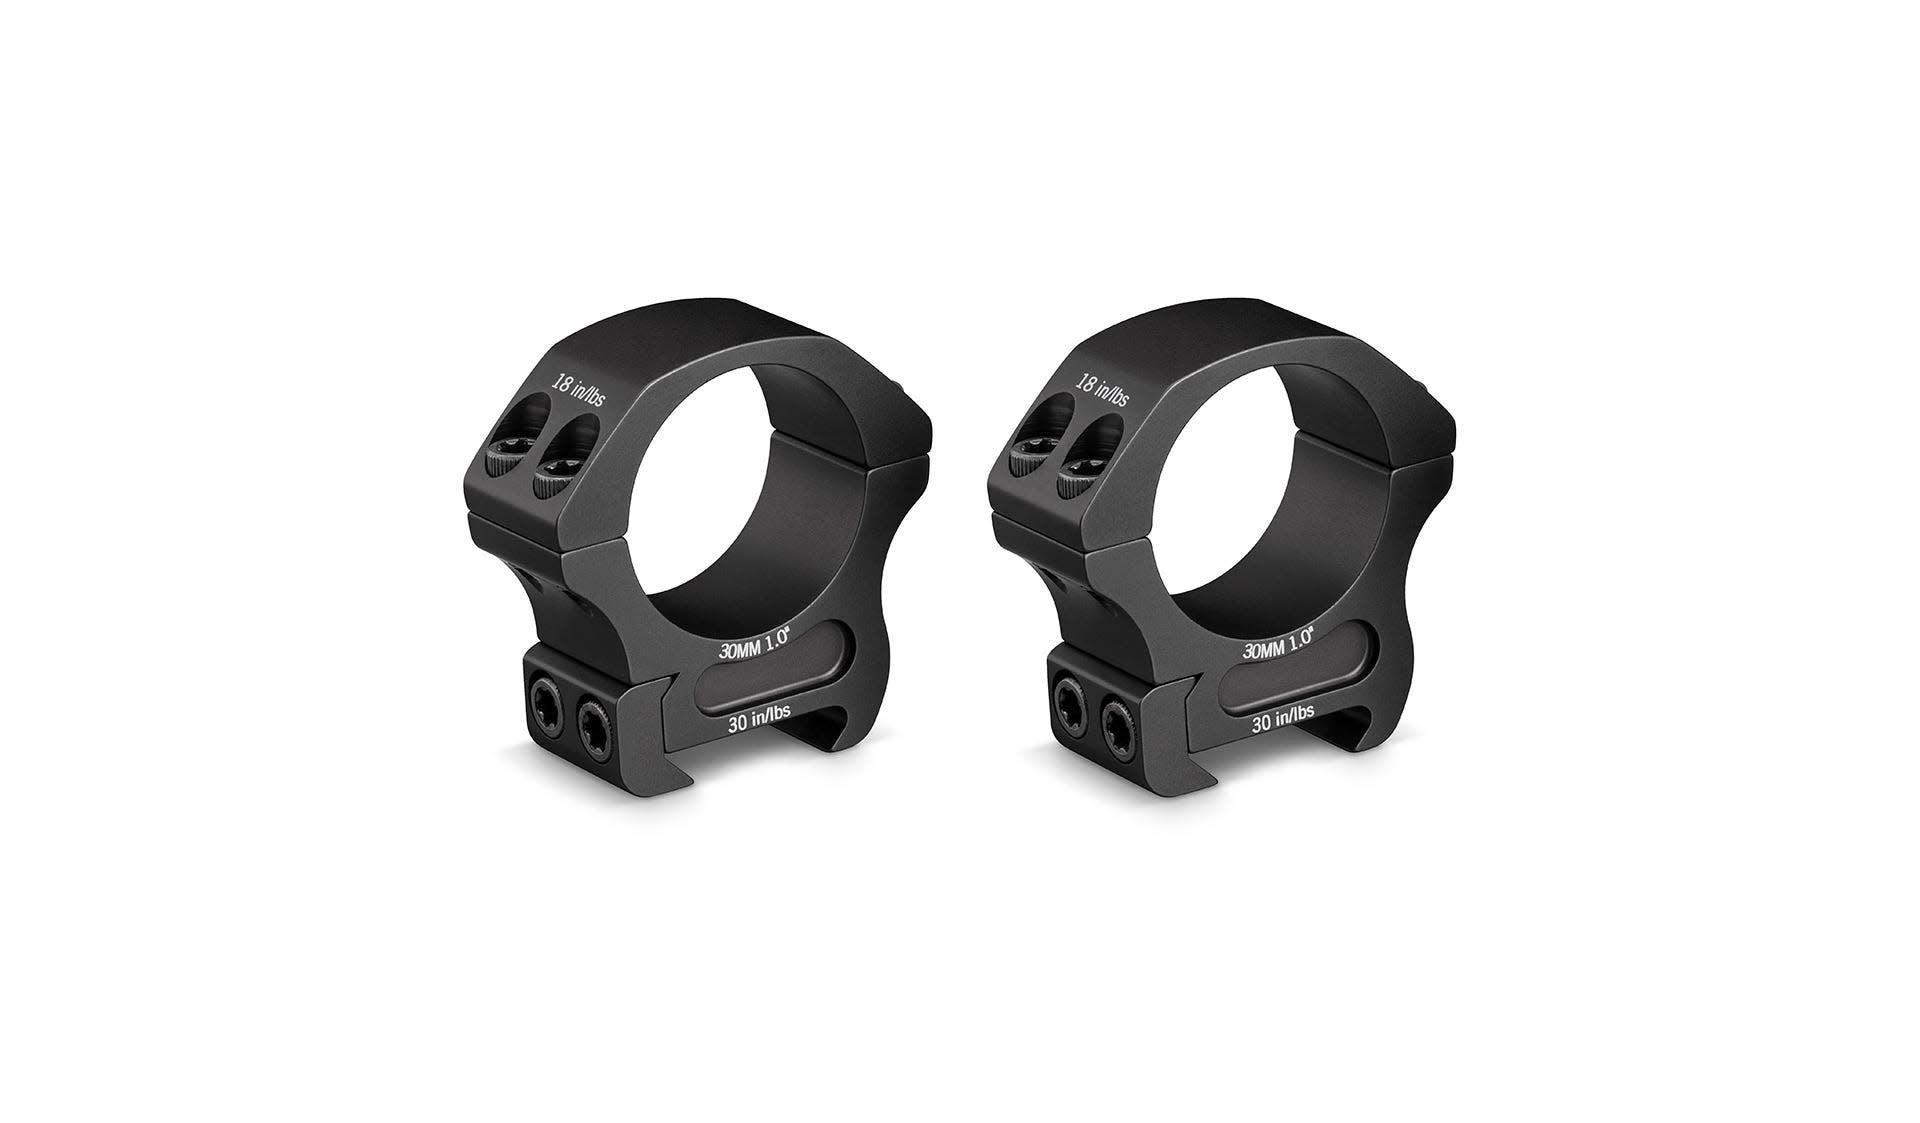 Vortex 30mm Low Pro Rings